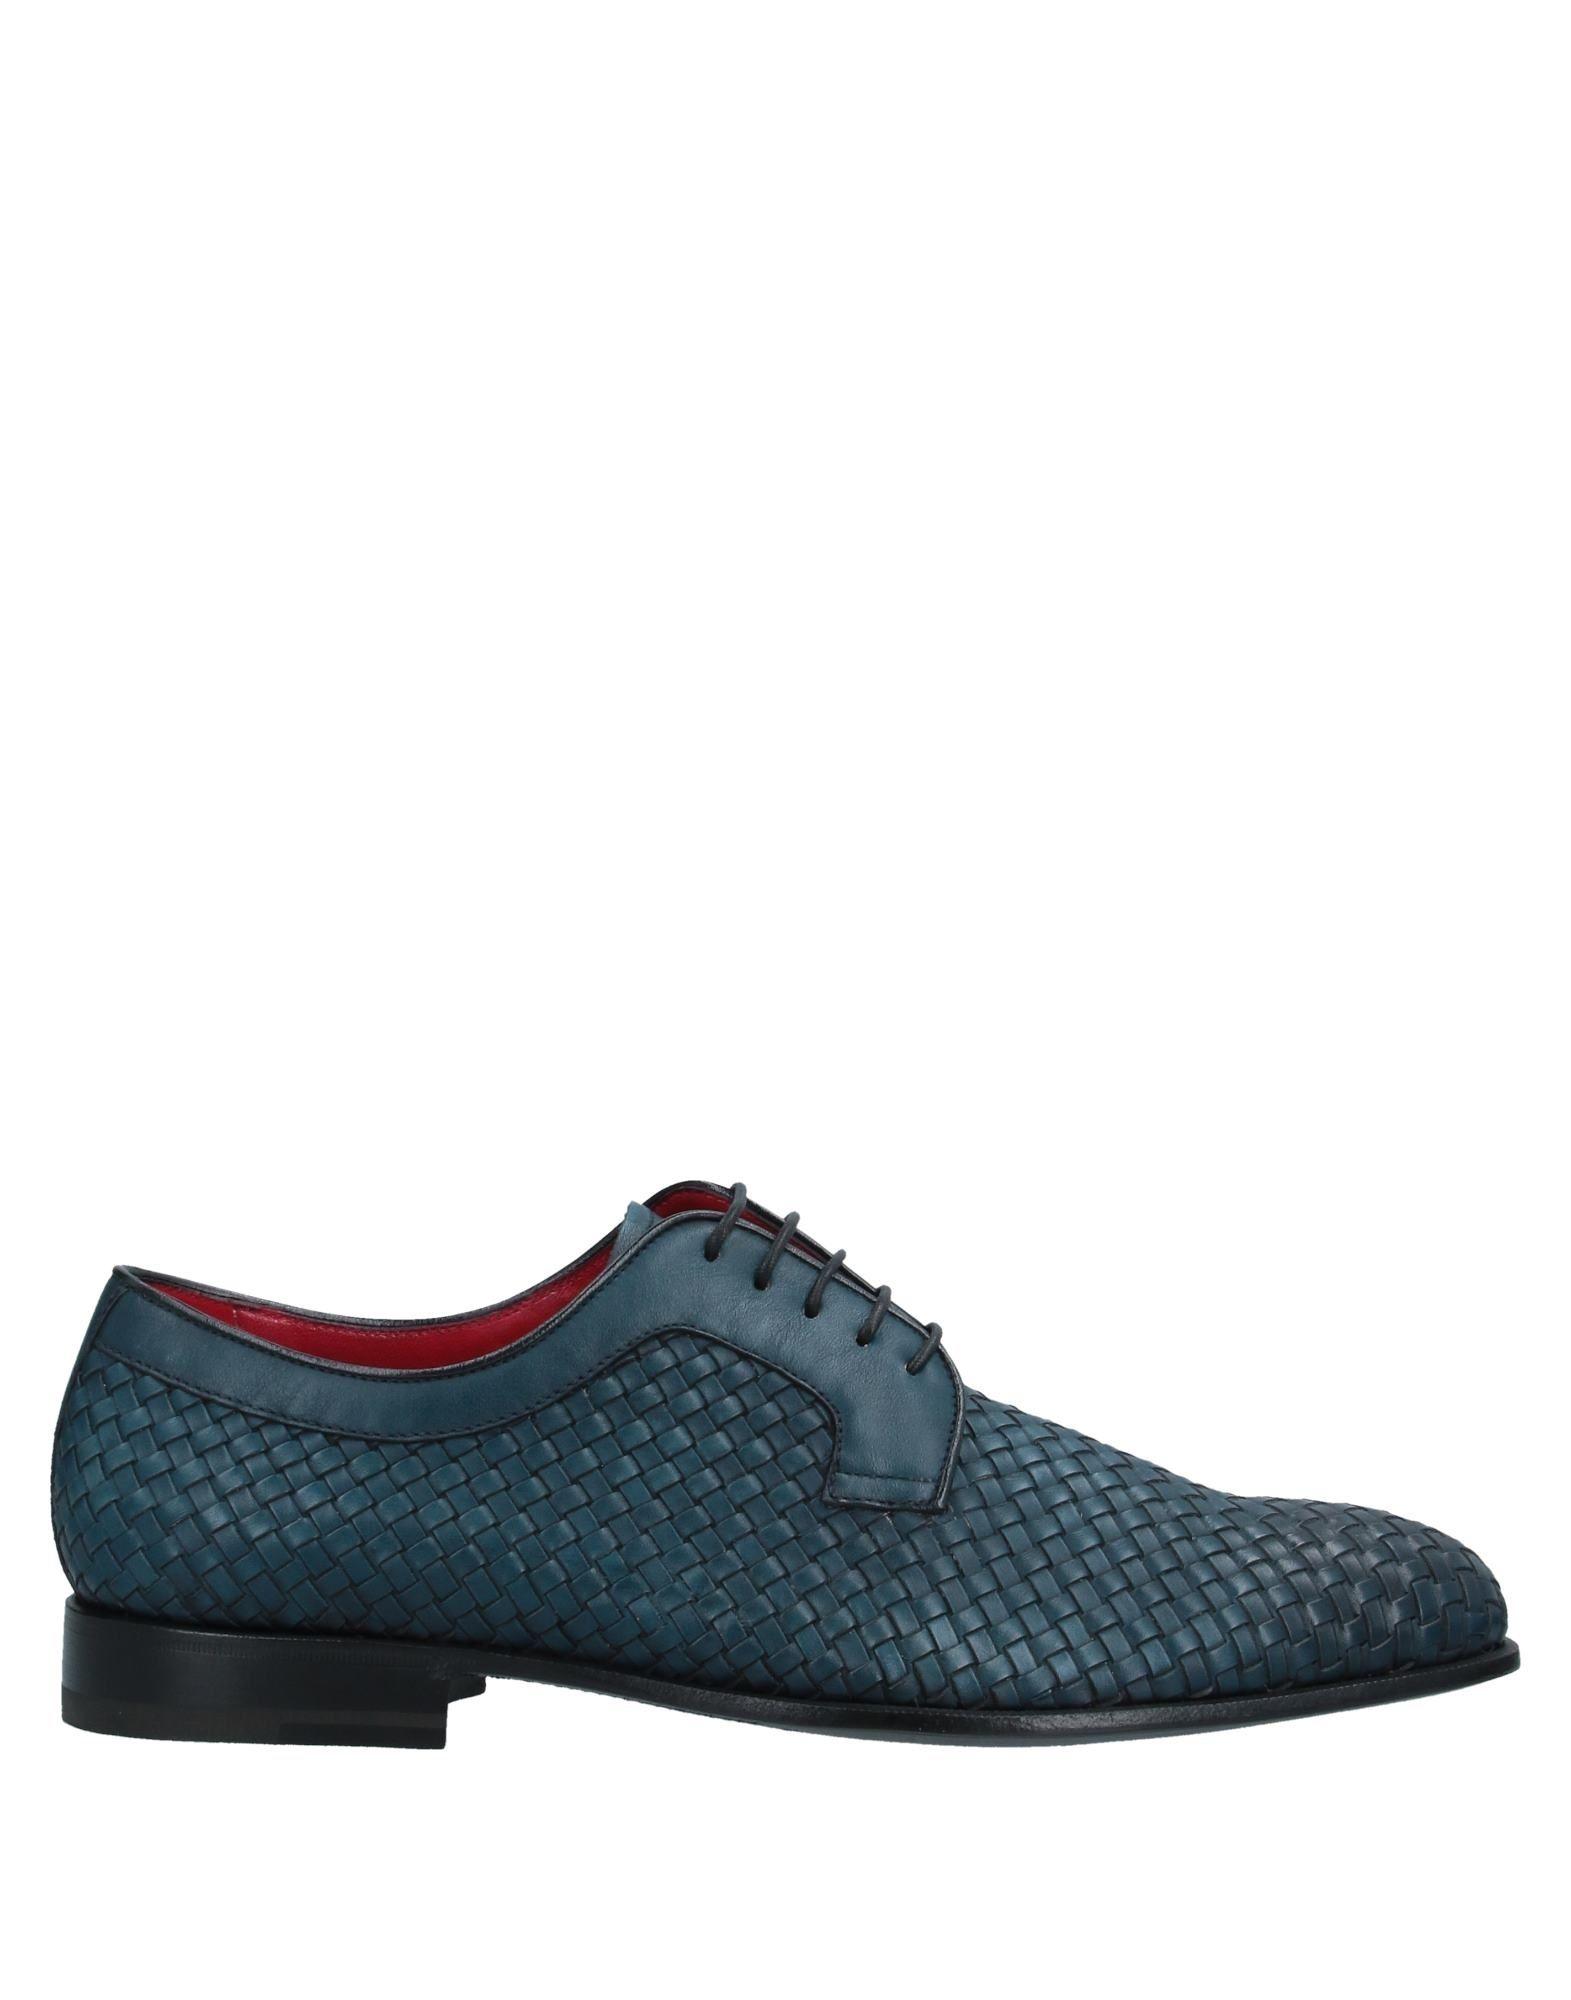 BARRETT Обувь на шнурках blu barrett by barrett обувь на шнурках